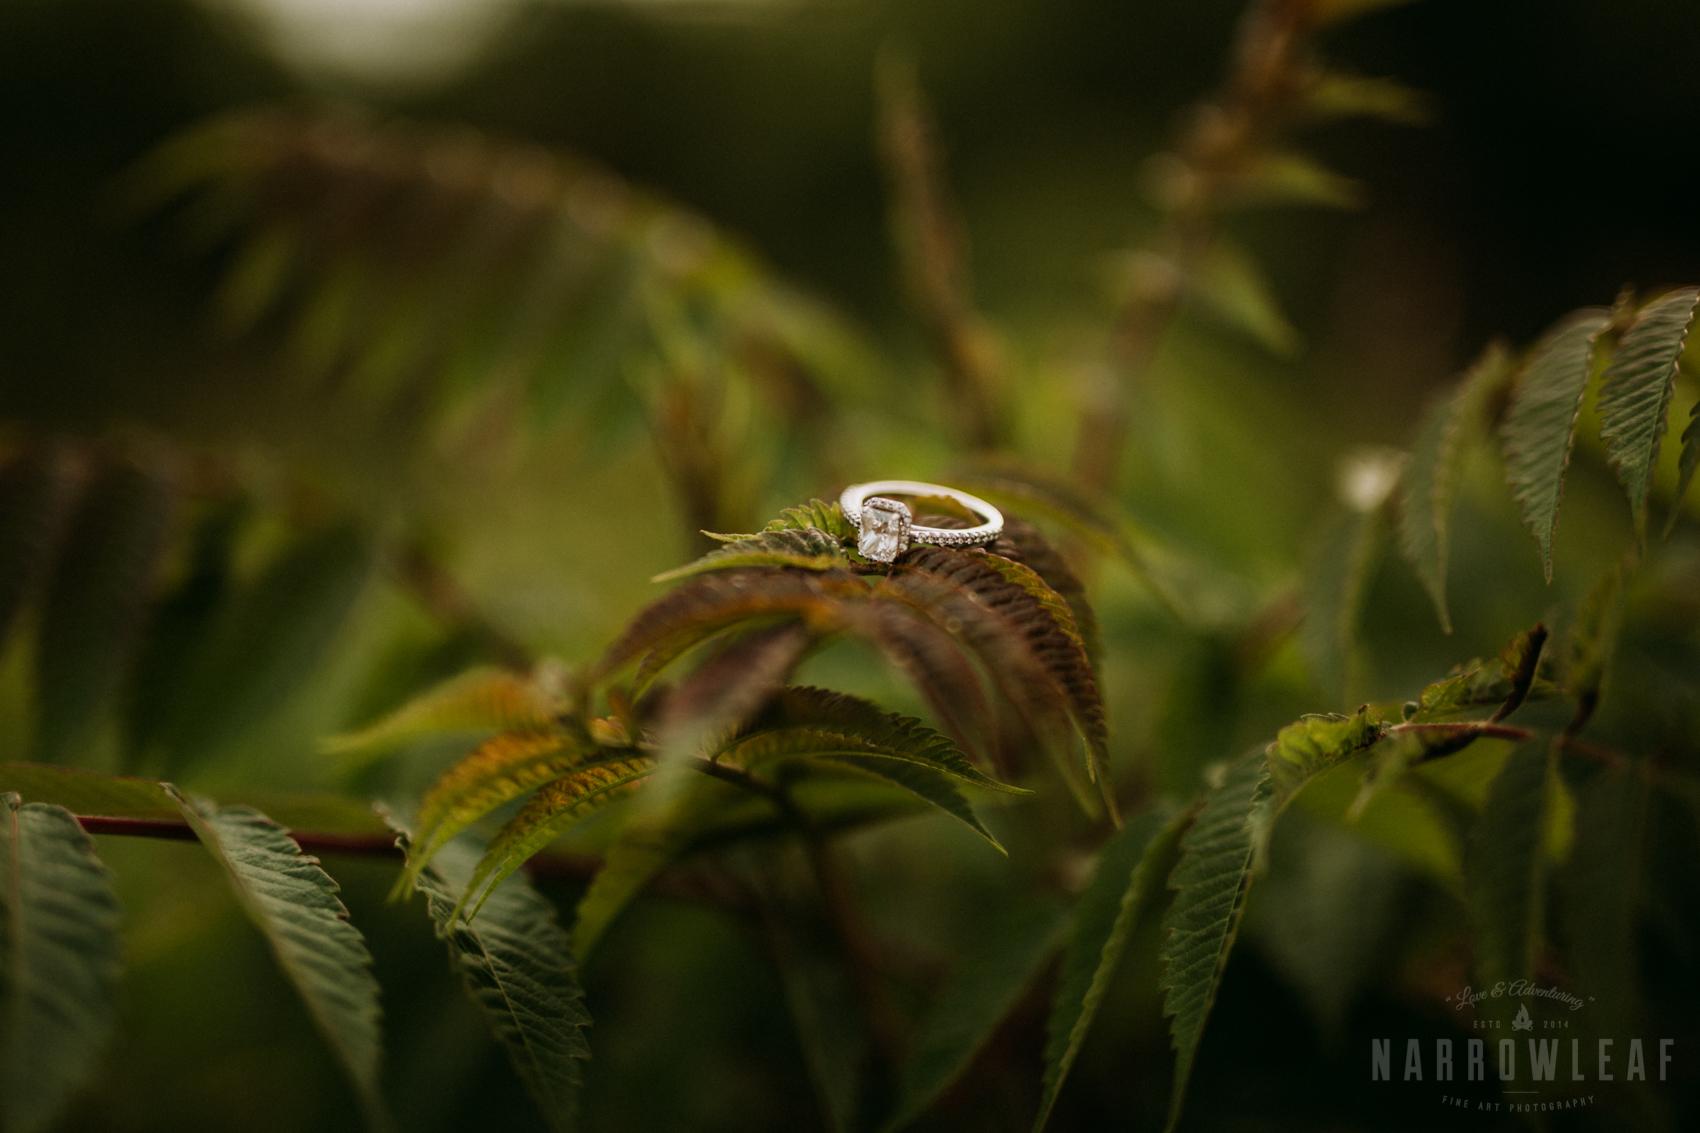 summer-engagement-photos-frontenac-mn-NarrowLeaf_Love_&_Adventure_Photography-14.jpg